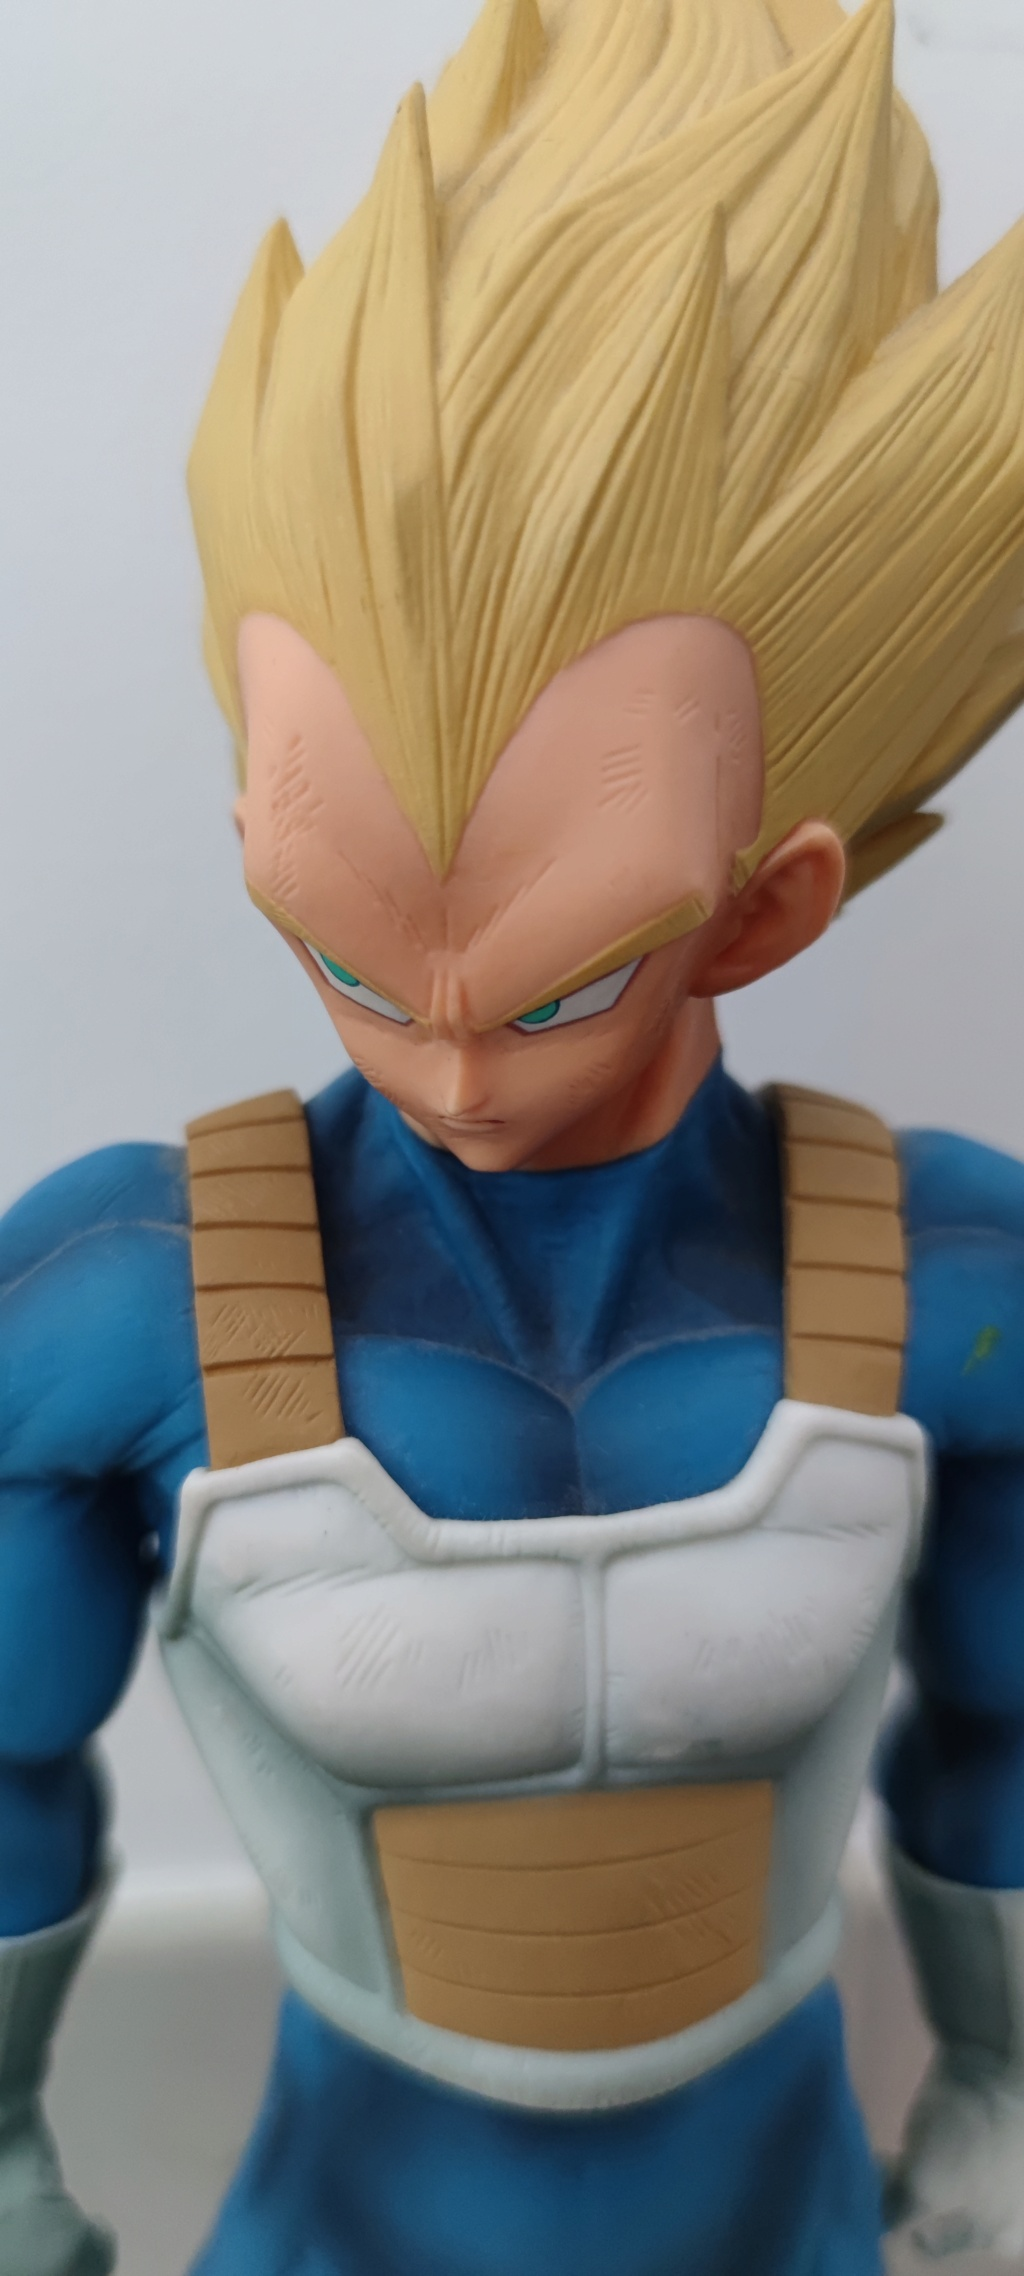 [VDS] Figurines Dragon Ball, One piece, Naruto, Megaman etc....  16162430